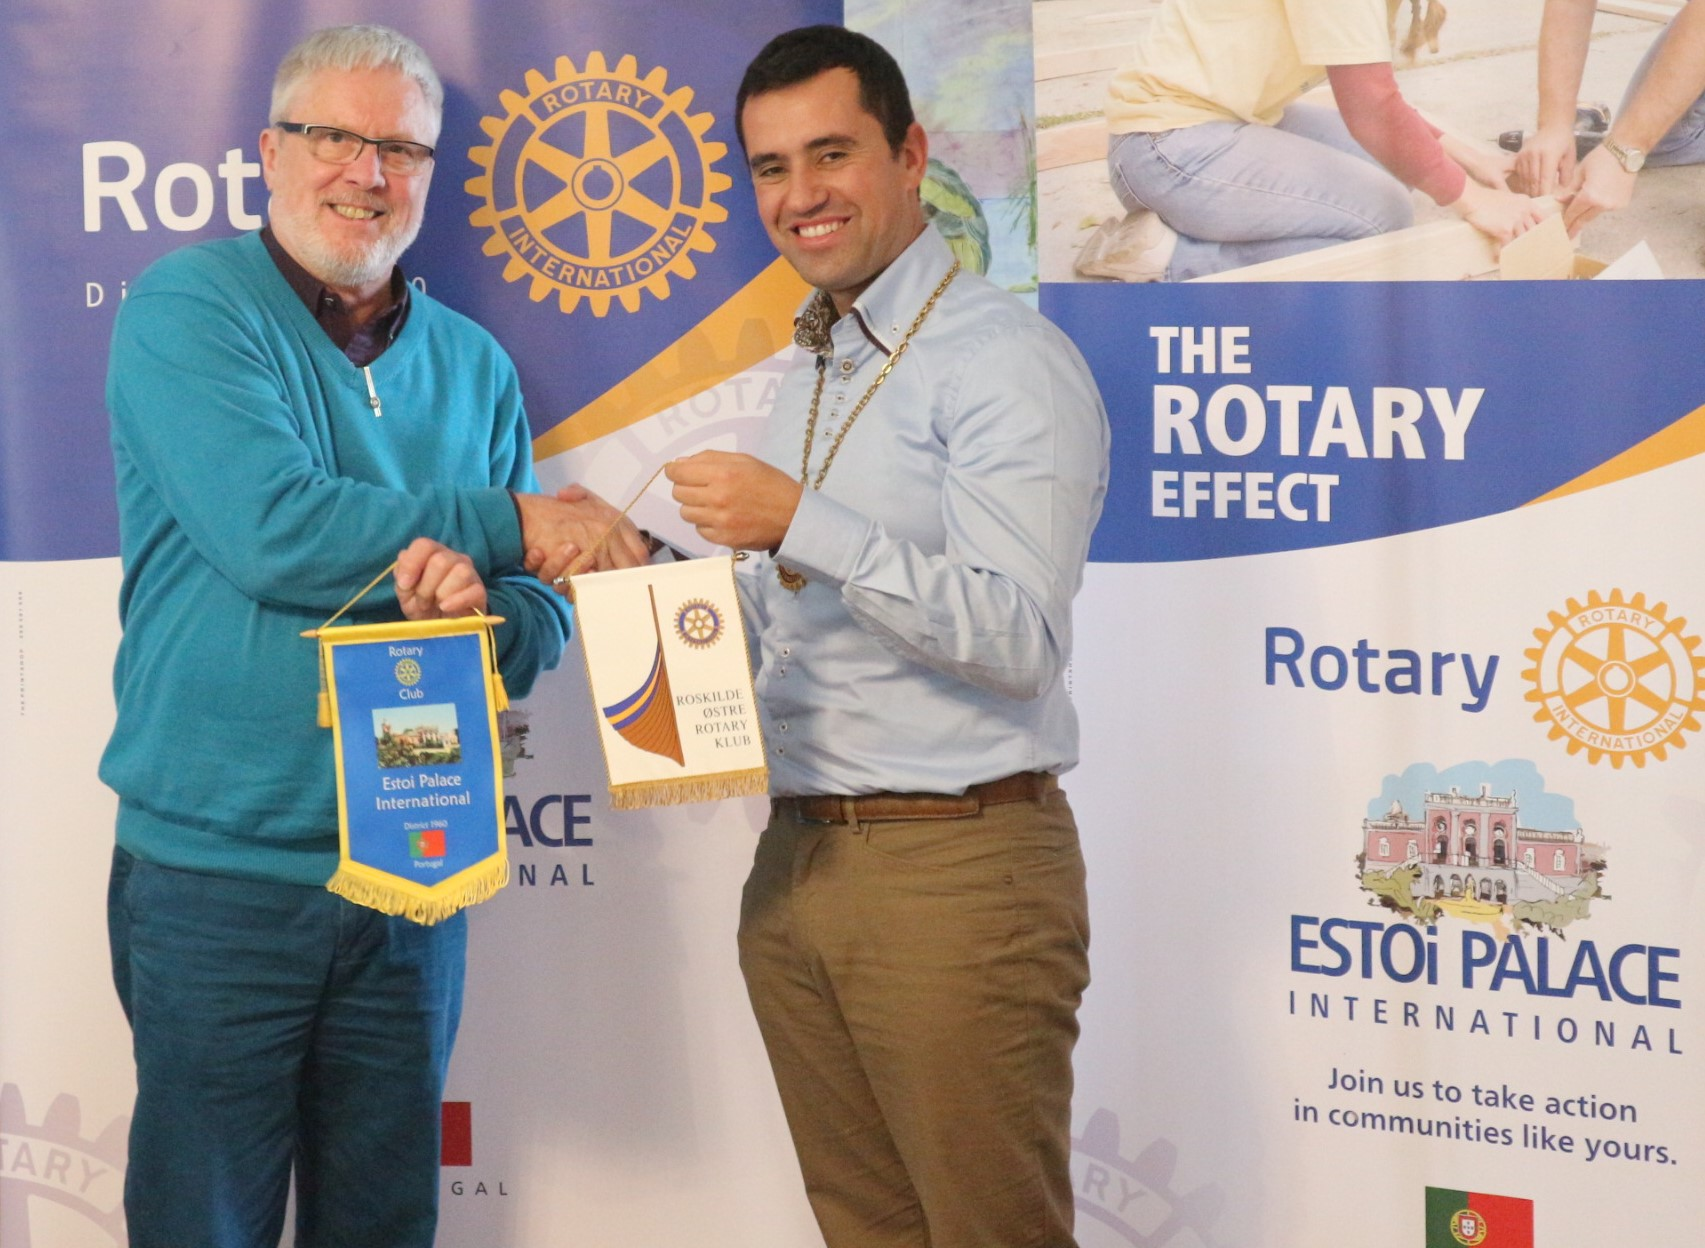 Rotary Image